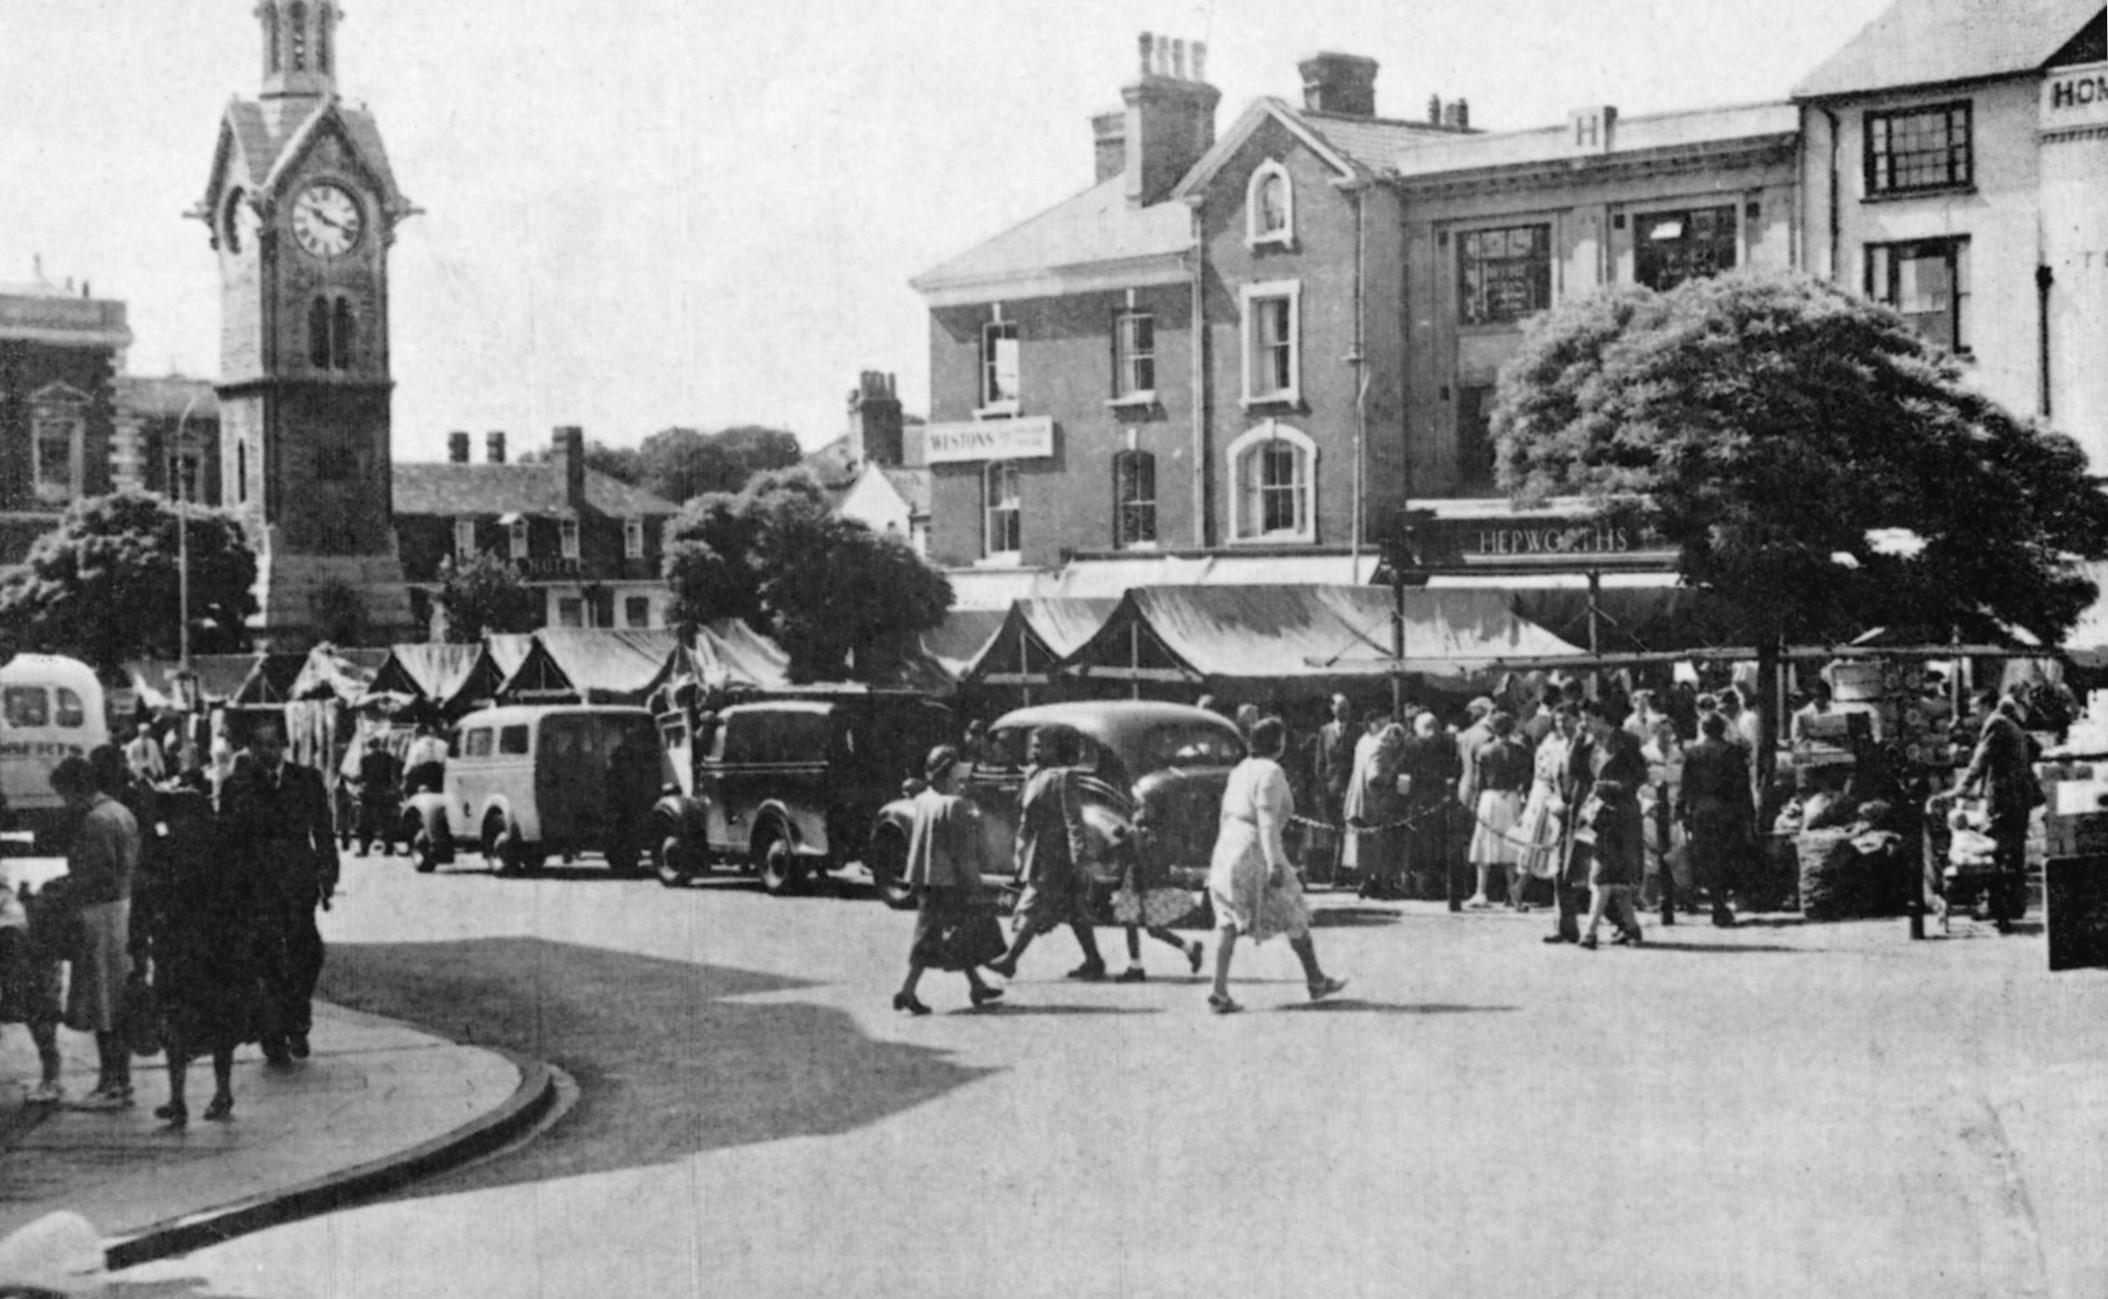 MArket square, Aylesbury, 1953